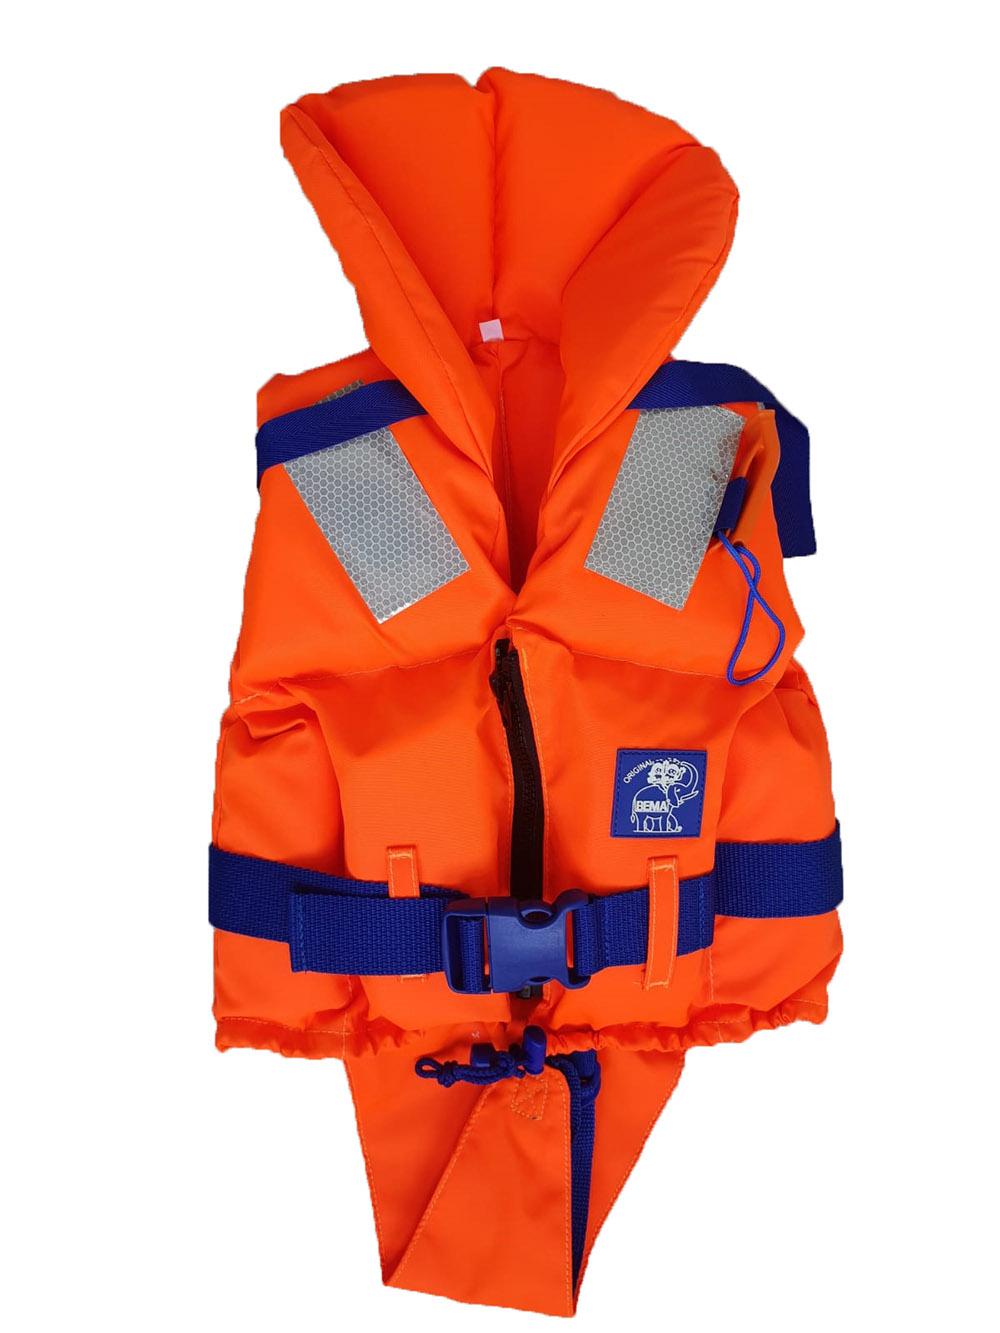 Babys Feststoff Rettungsweste Typ 100 EN ISO 12402-4